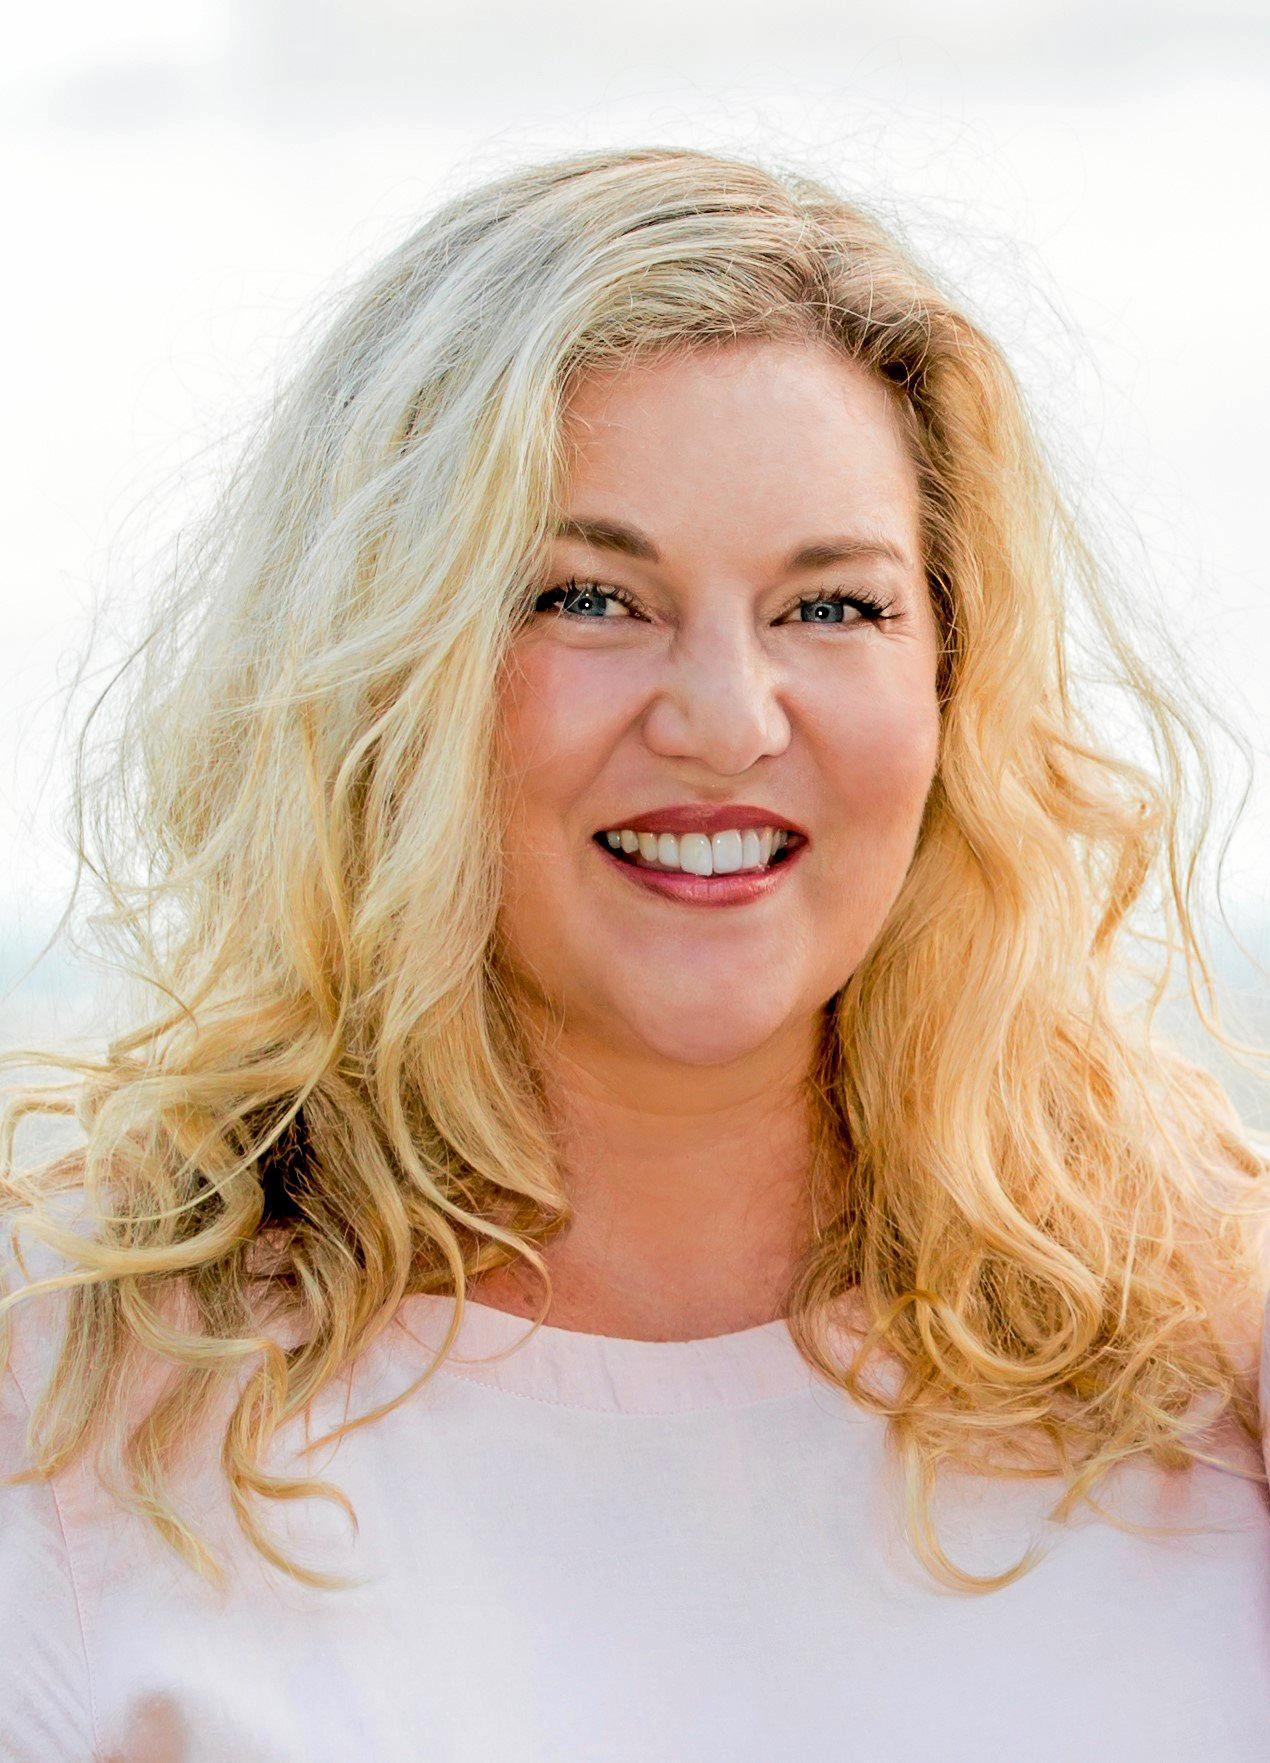 FOUNDER: Badderam creative director and founder Heidi Meyer.